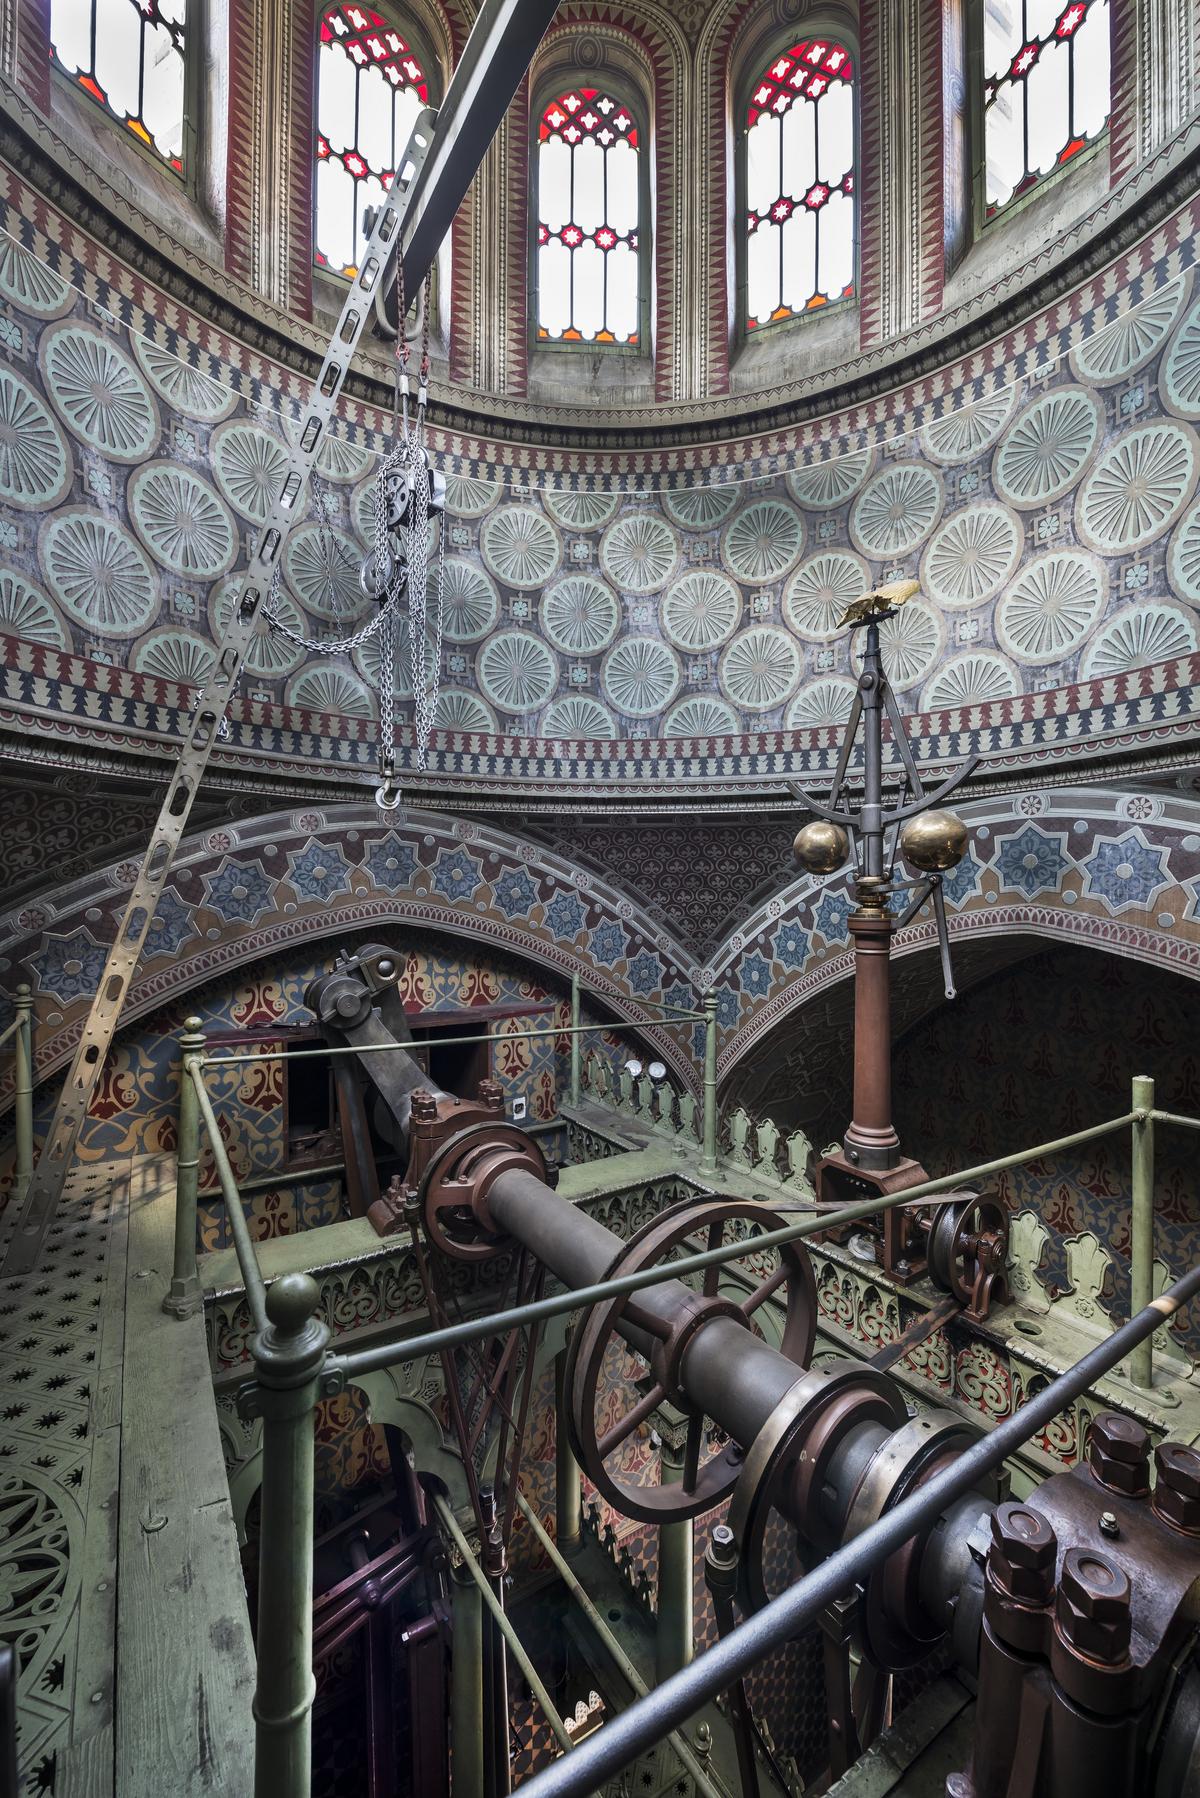 Billedresultat for pumpenhaus moschee potsdam